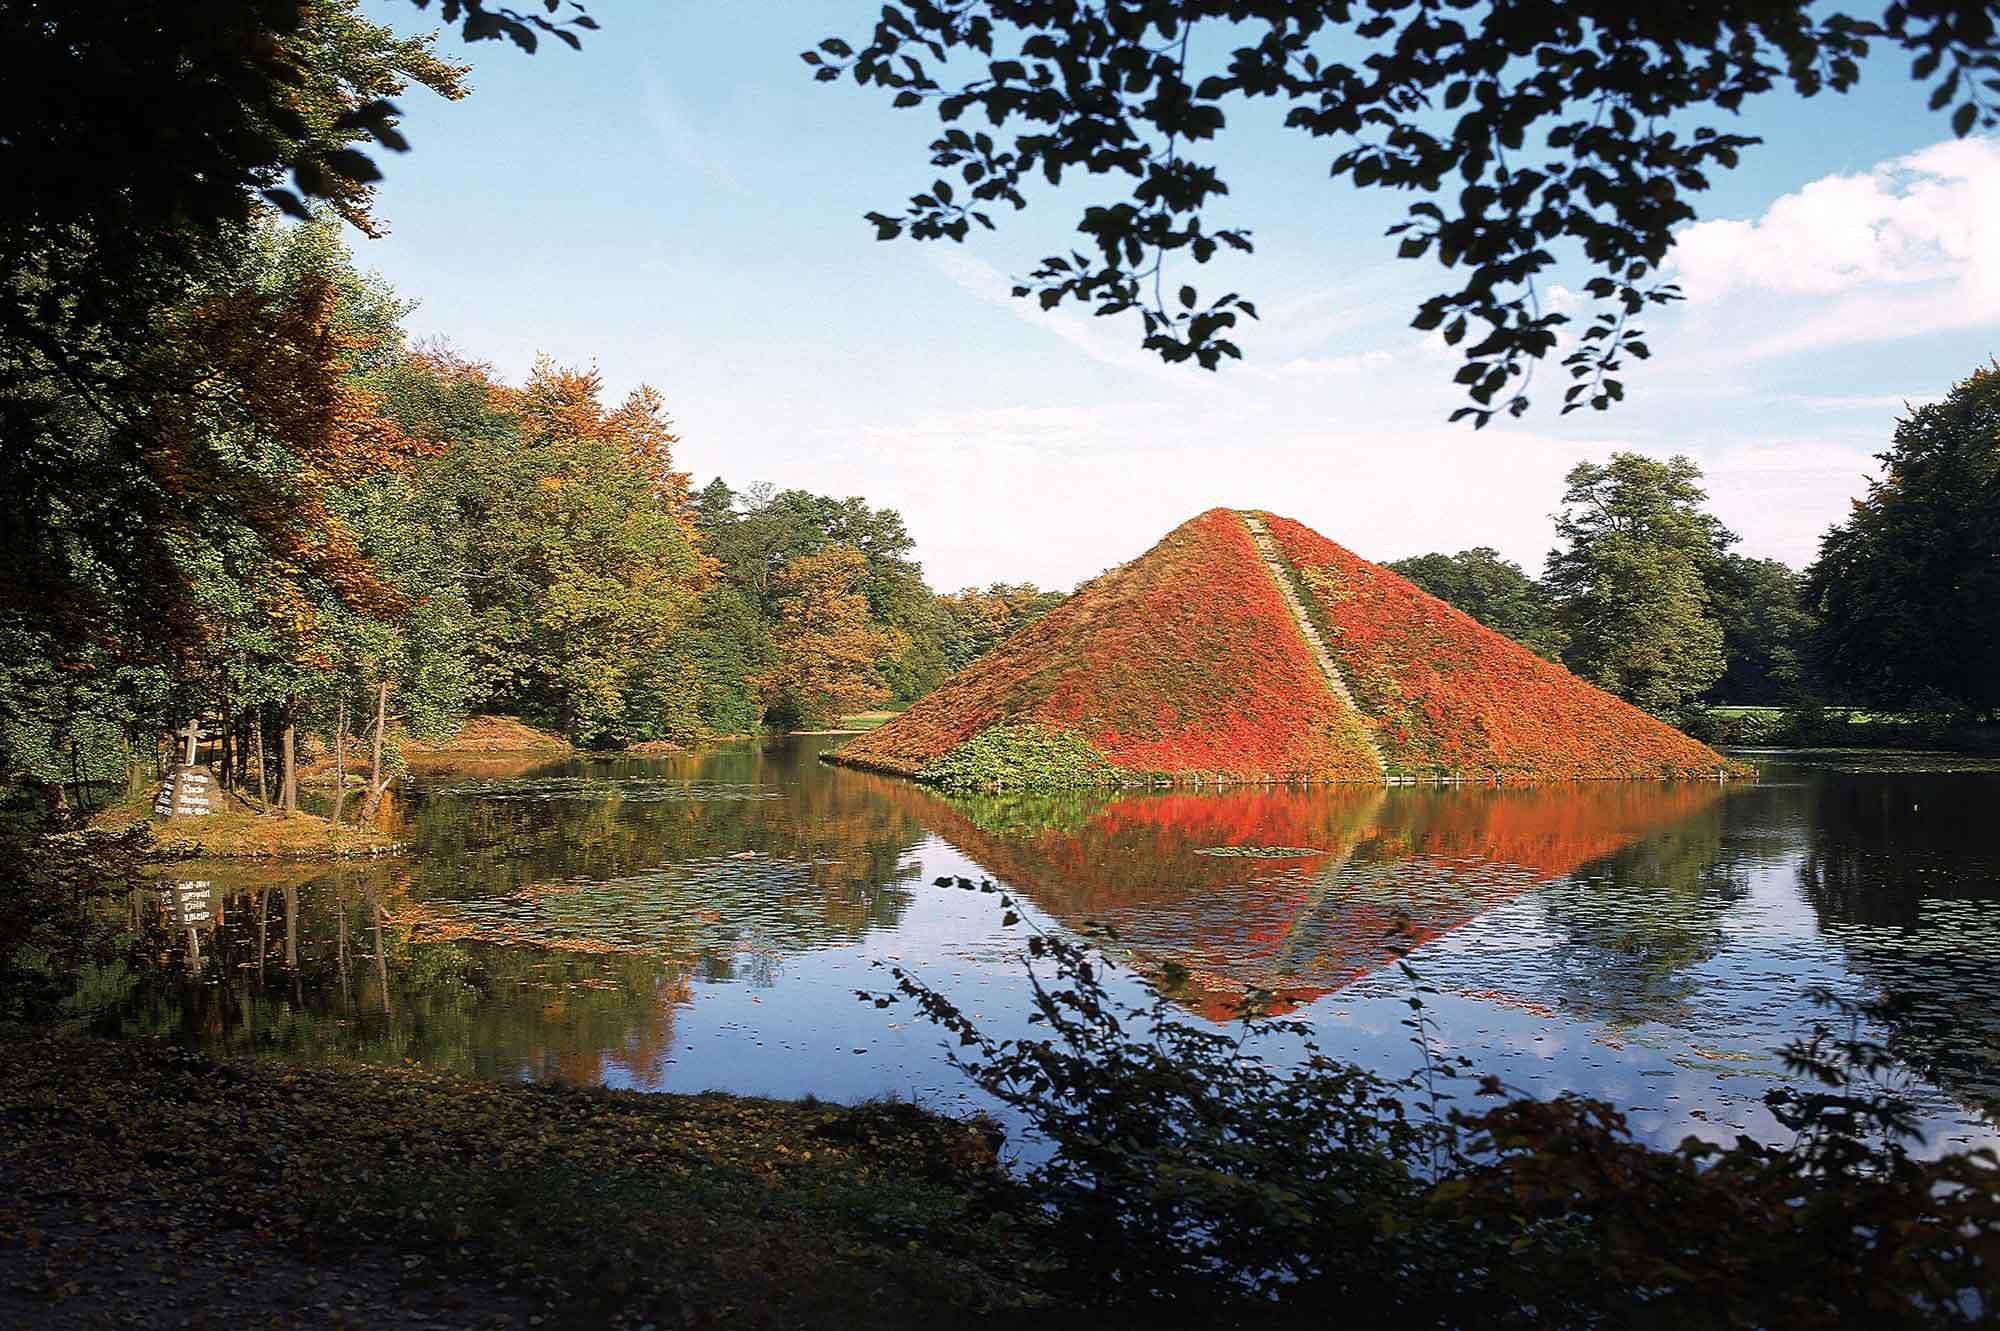 Ascori Kontakt Pyramide Cottbus